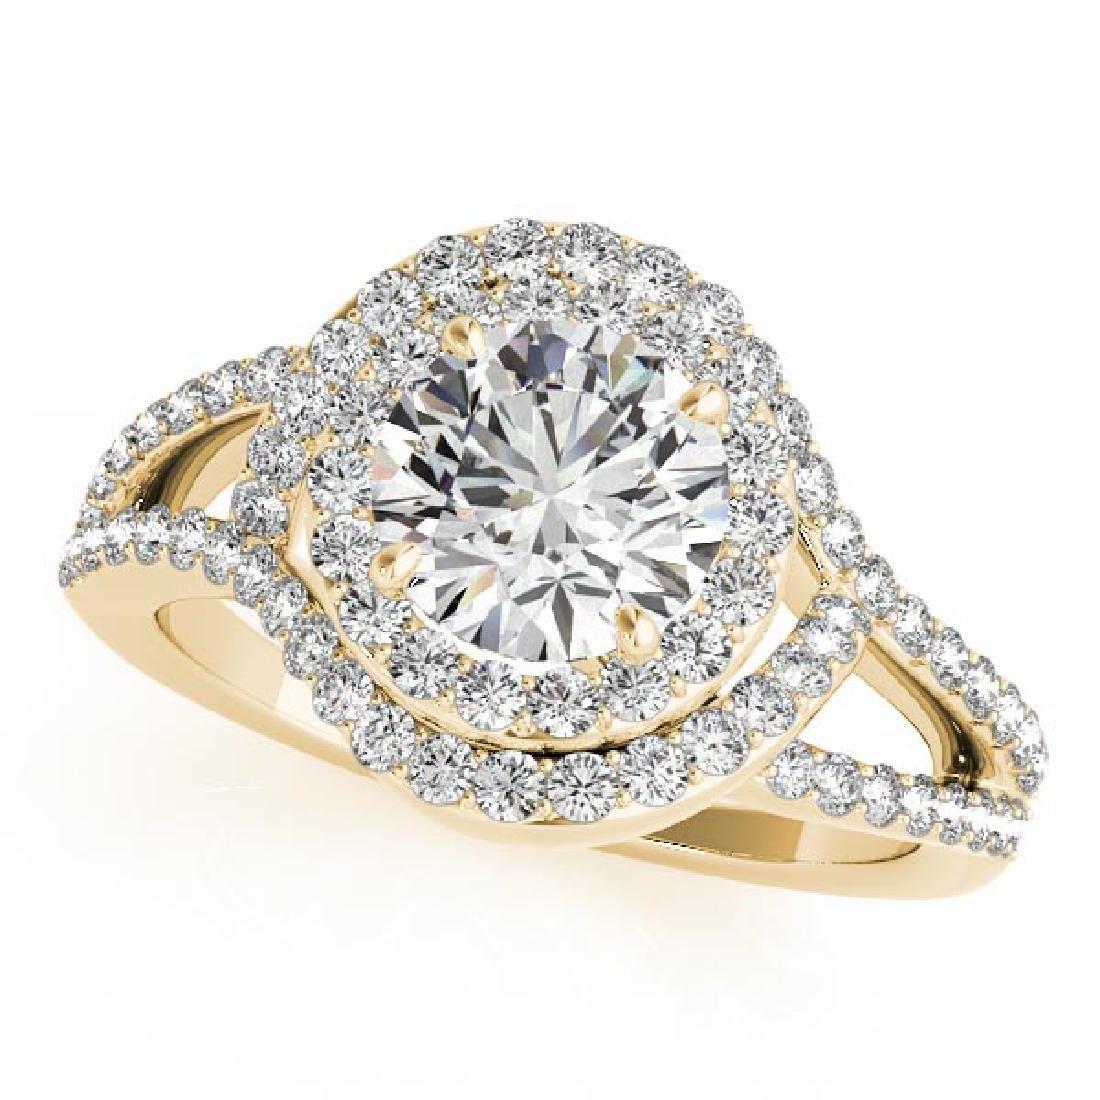 CERTIFIED 14KT WHITE GOLD 1.68 CT G-H/VS-SI1 DIAMOND HA